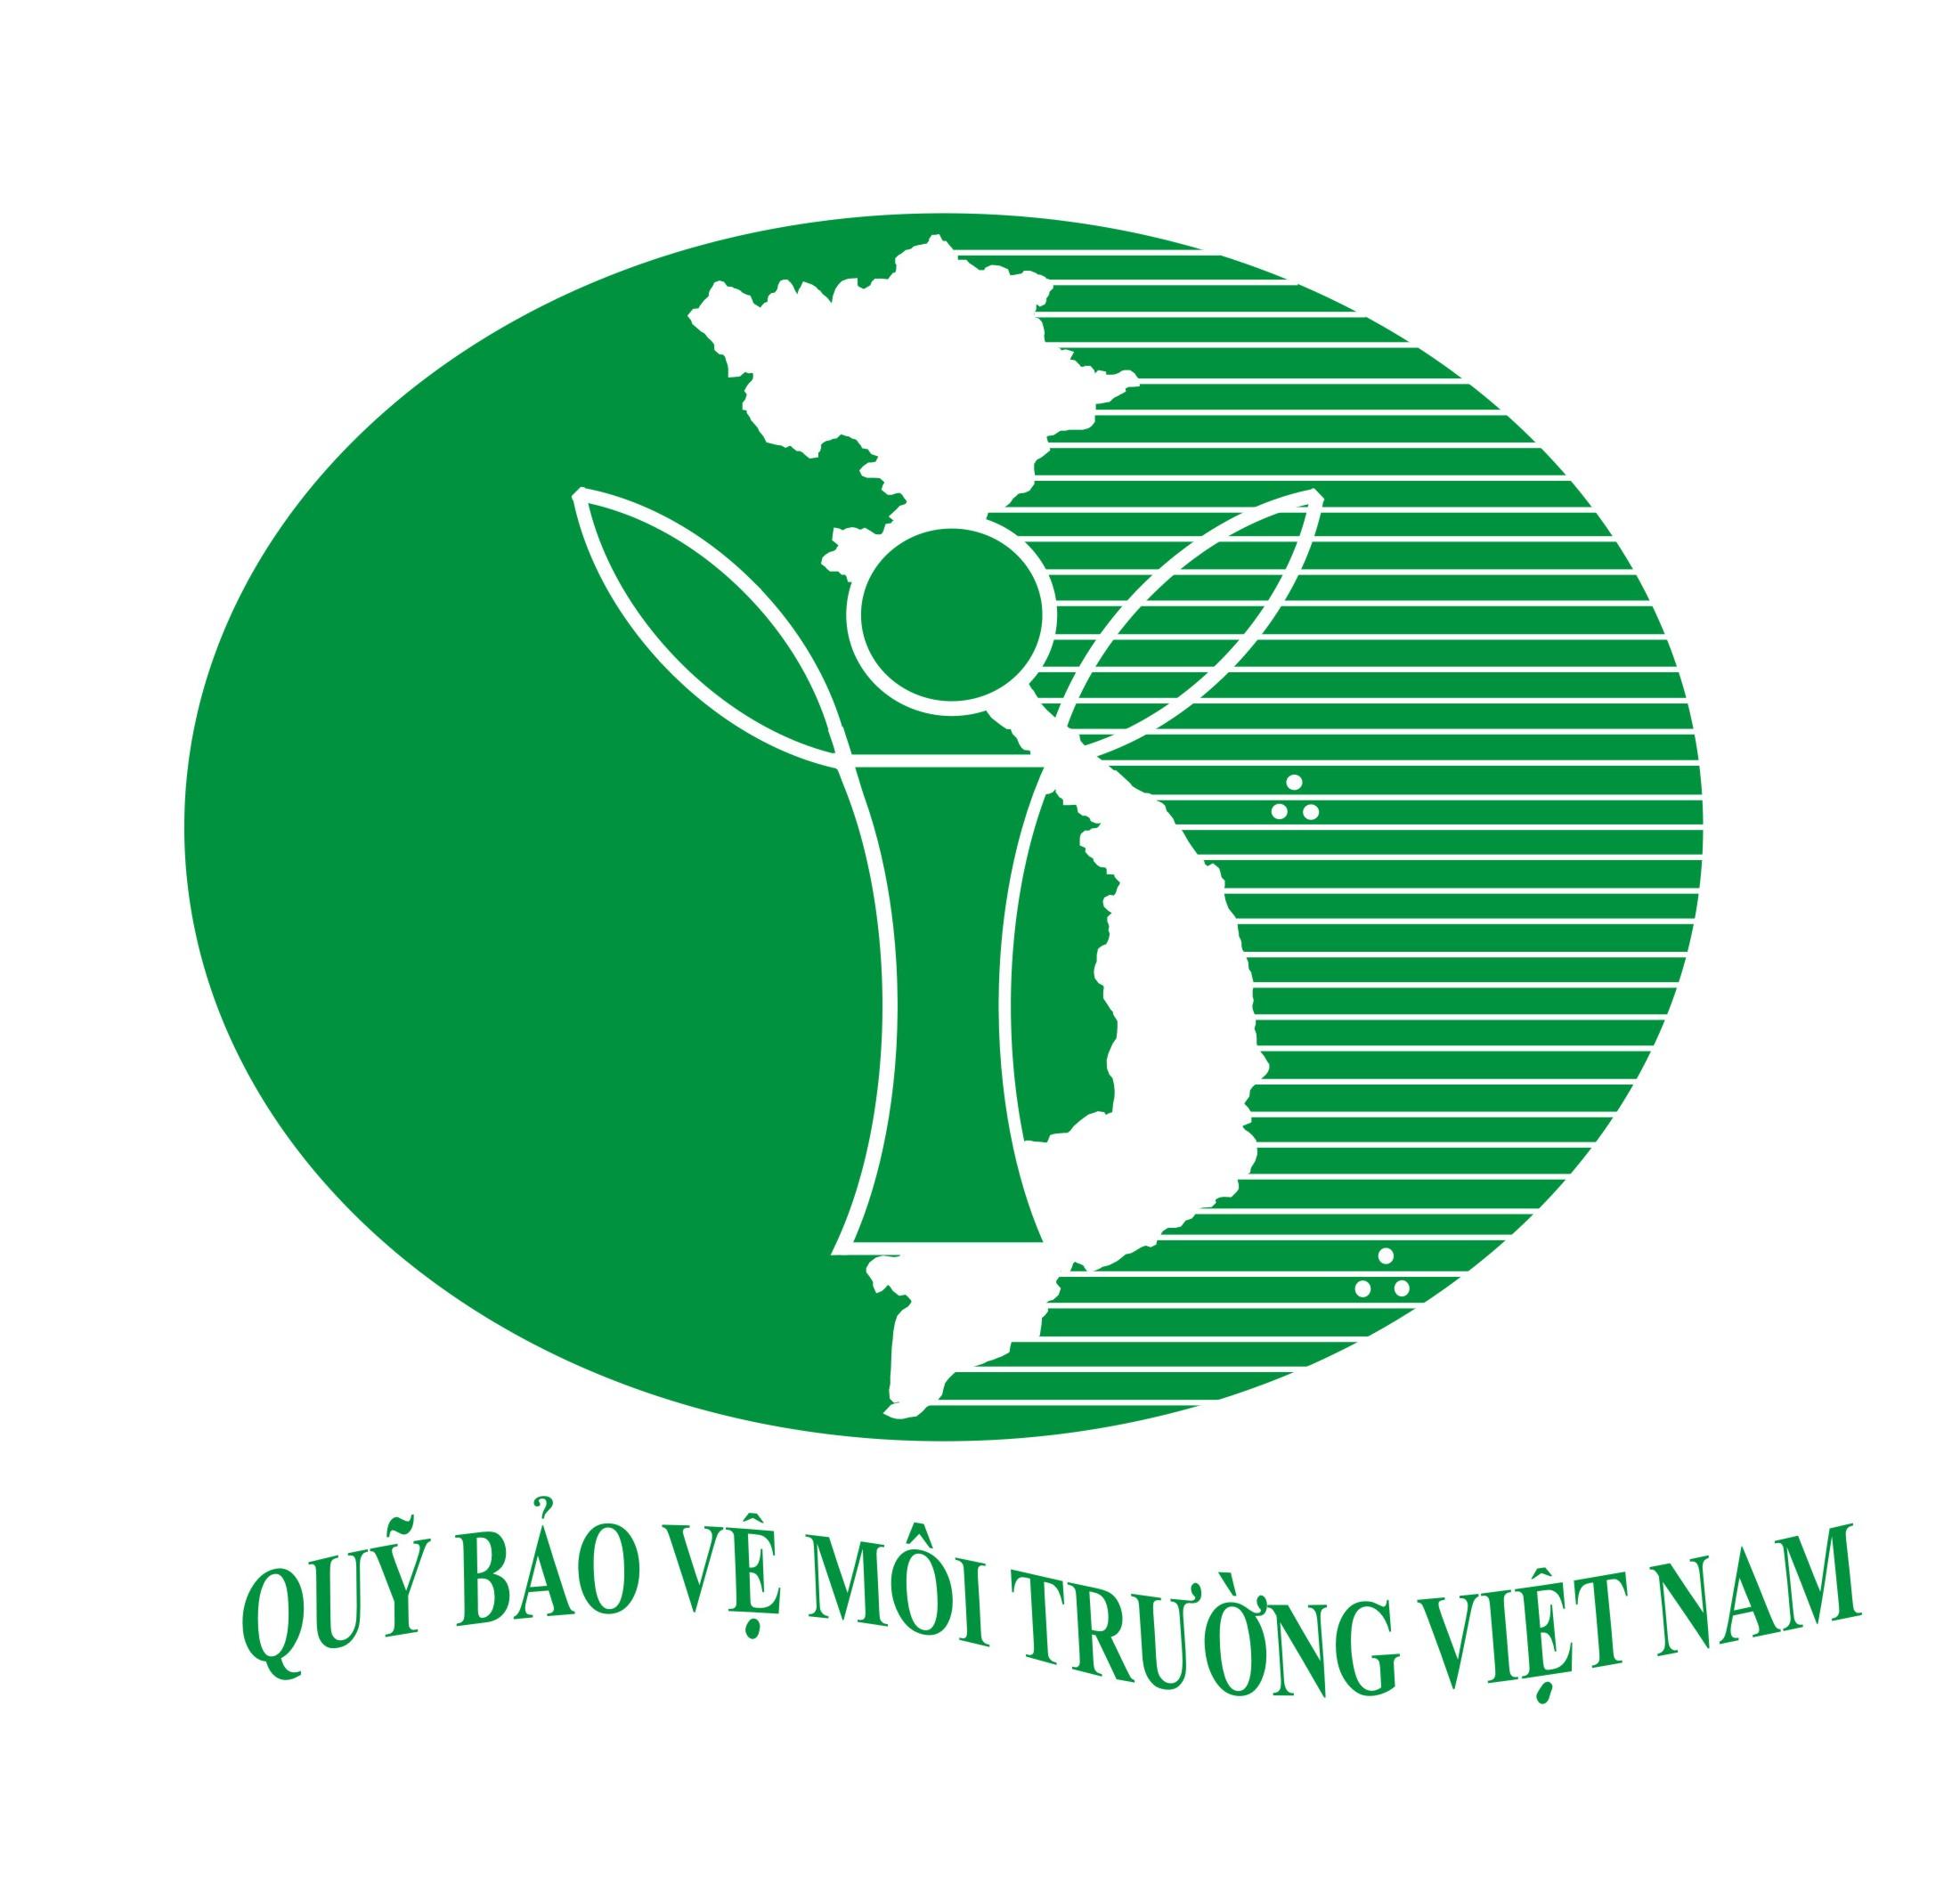 de xuat nang muc von dieu le cua quy bao ve moi truong viet nam len 3000 ty dong